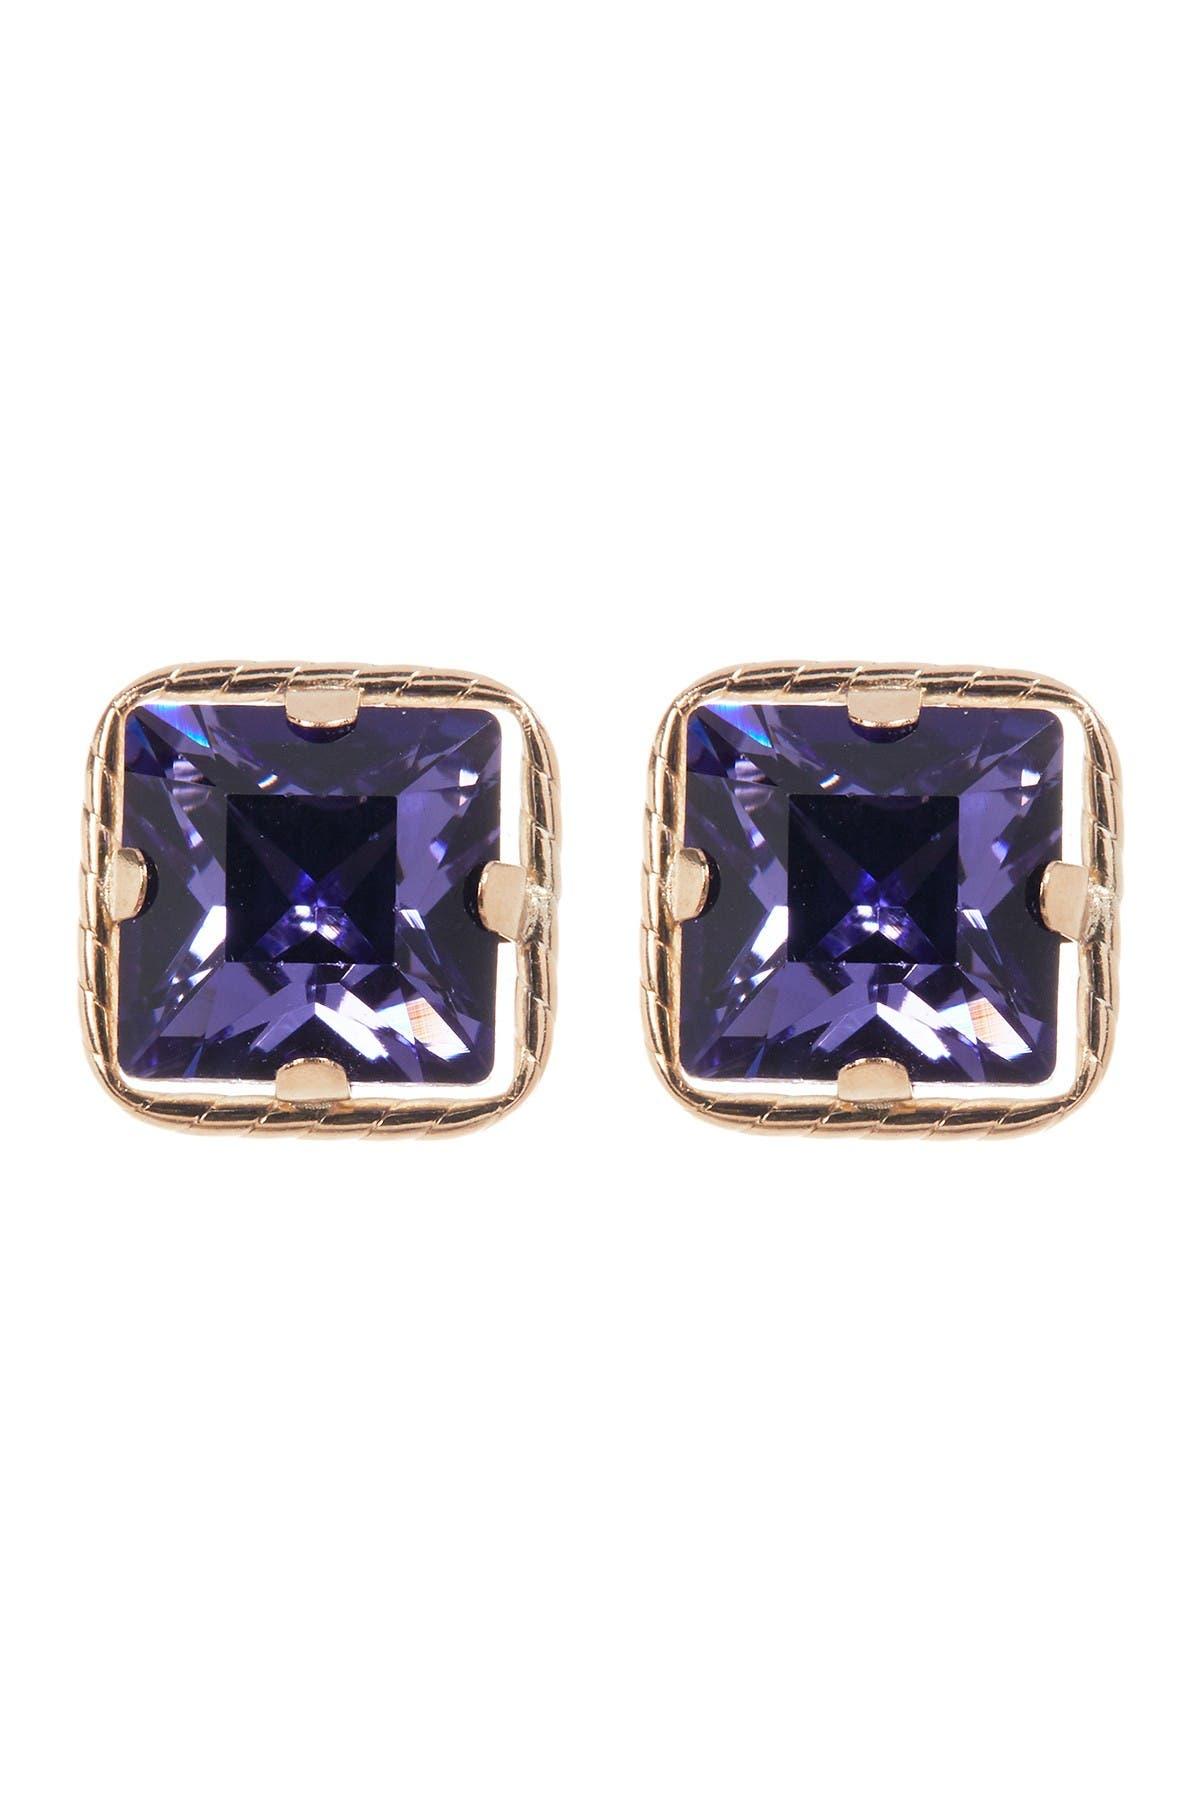 Image of Candela 10K Yellow Gold Sqaure Tanzanite Crystal Stud Earrings